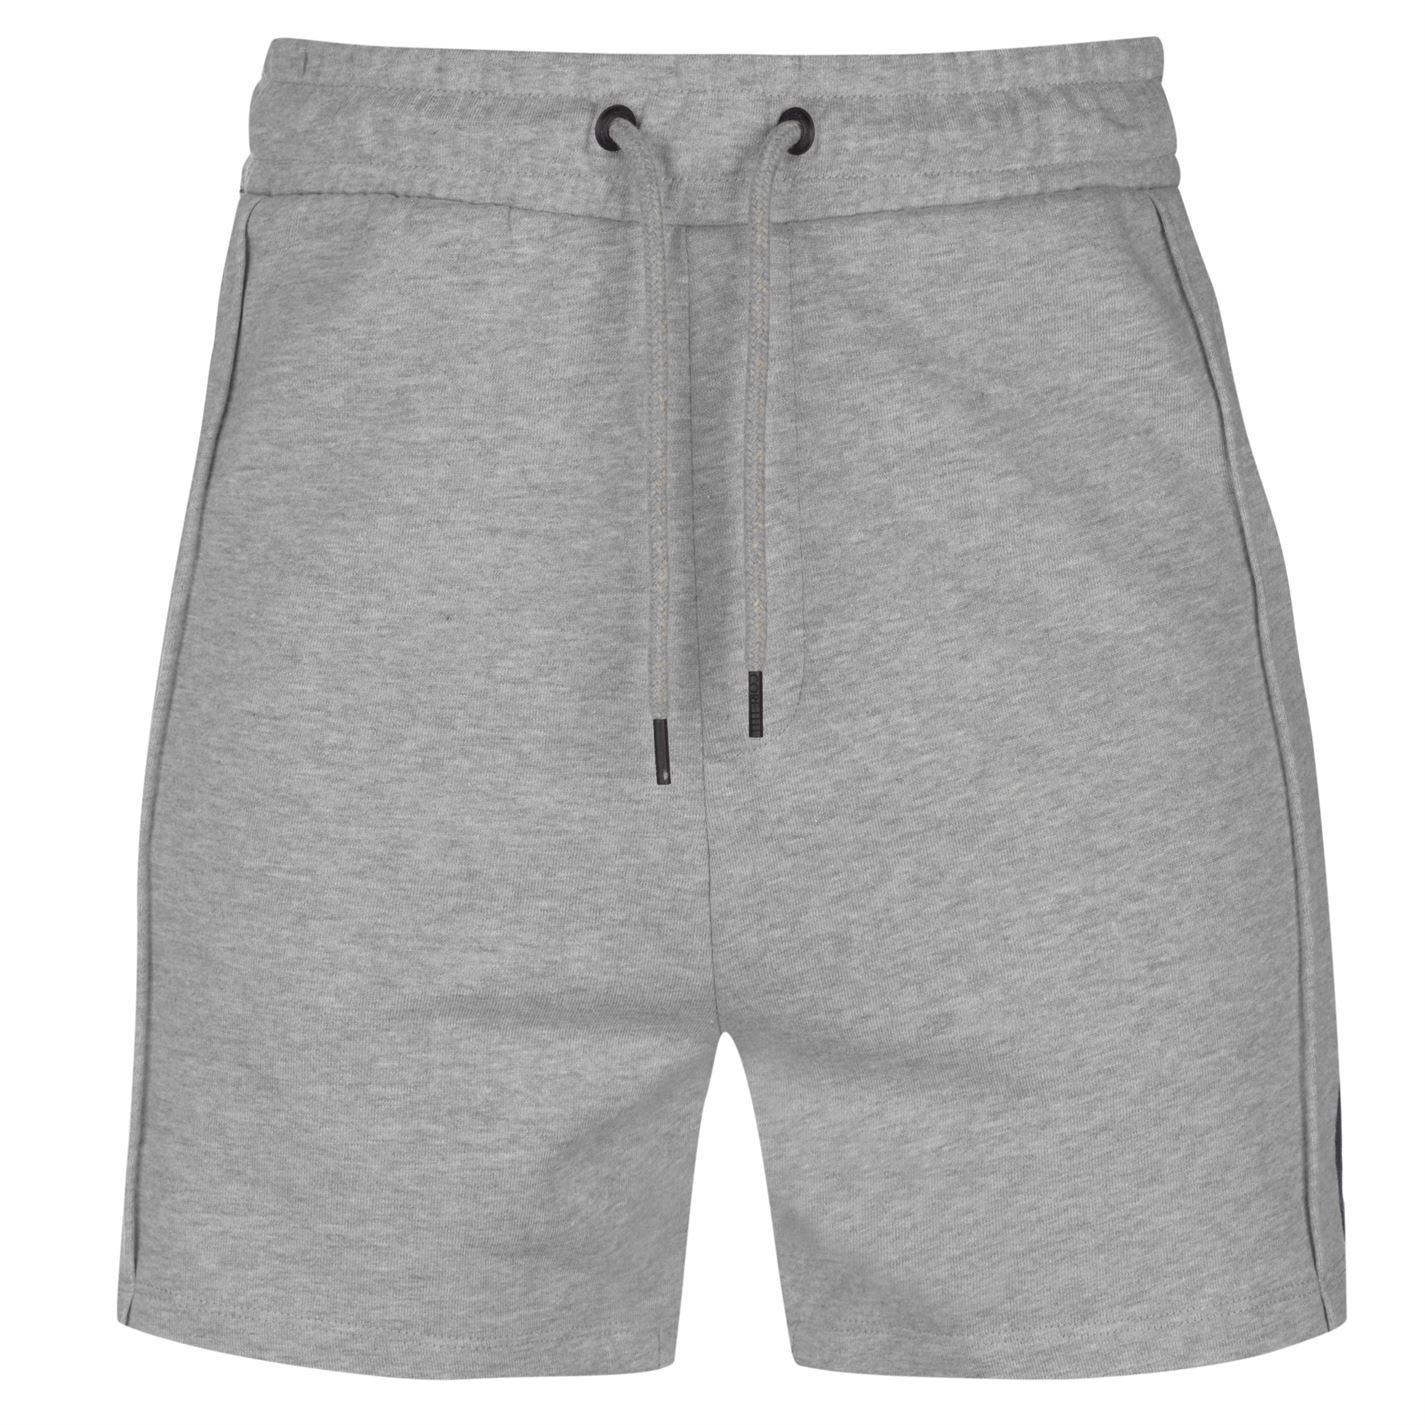 Jack-amp-Jones-Core-Dexter-Shorts-Mens-Bottoms-Short-Pants-Summerwear thumbnail 4